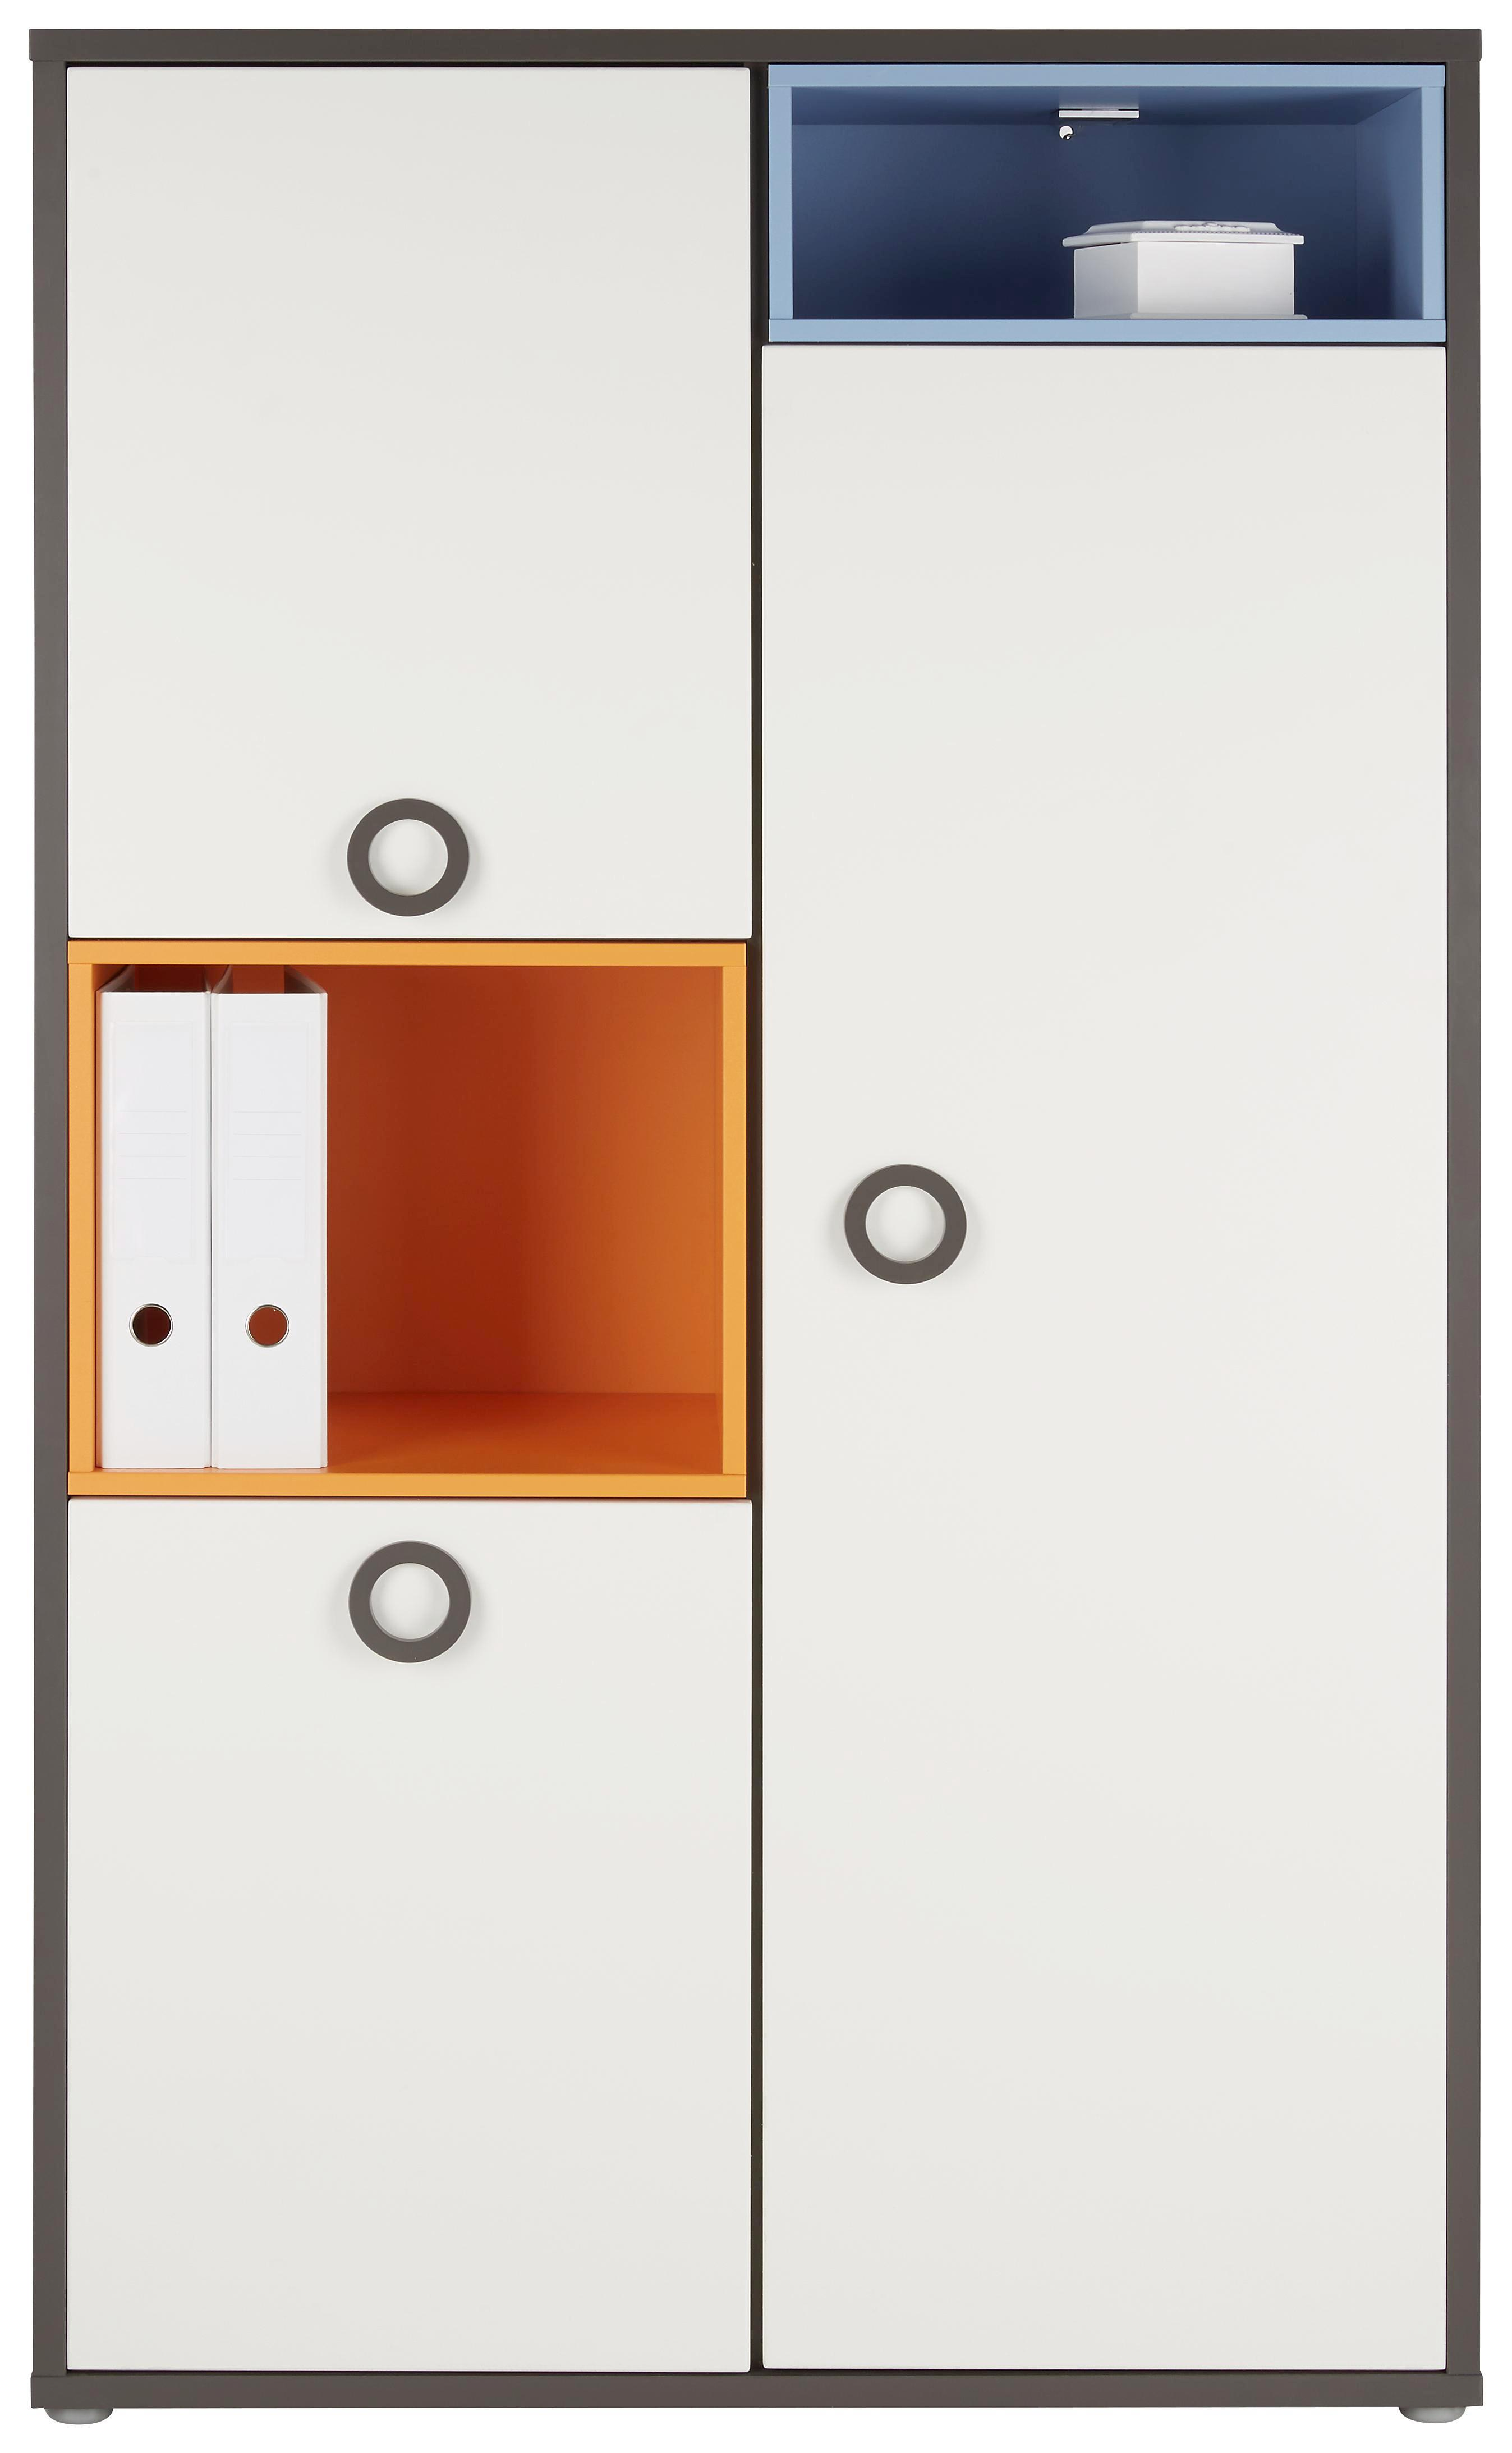 Highboard in Weiß/Grau/orange/blau - Blau/Alufarben, KONVENTIONELL, Holzwerkstoff/Kunststoff (95/160/42cm) - MODERN LIVING